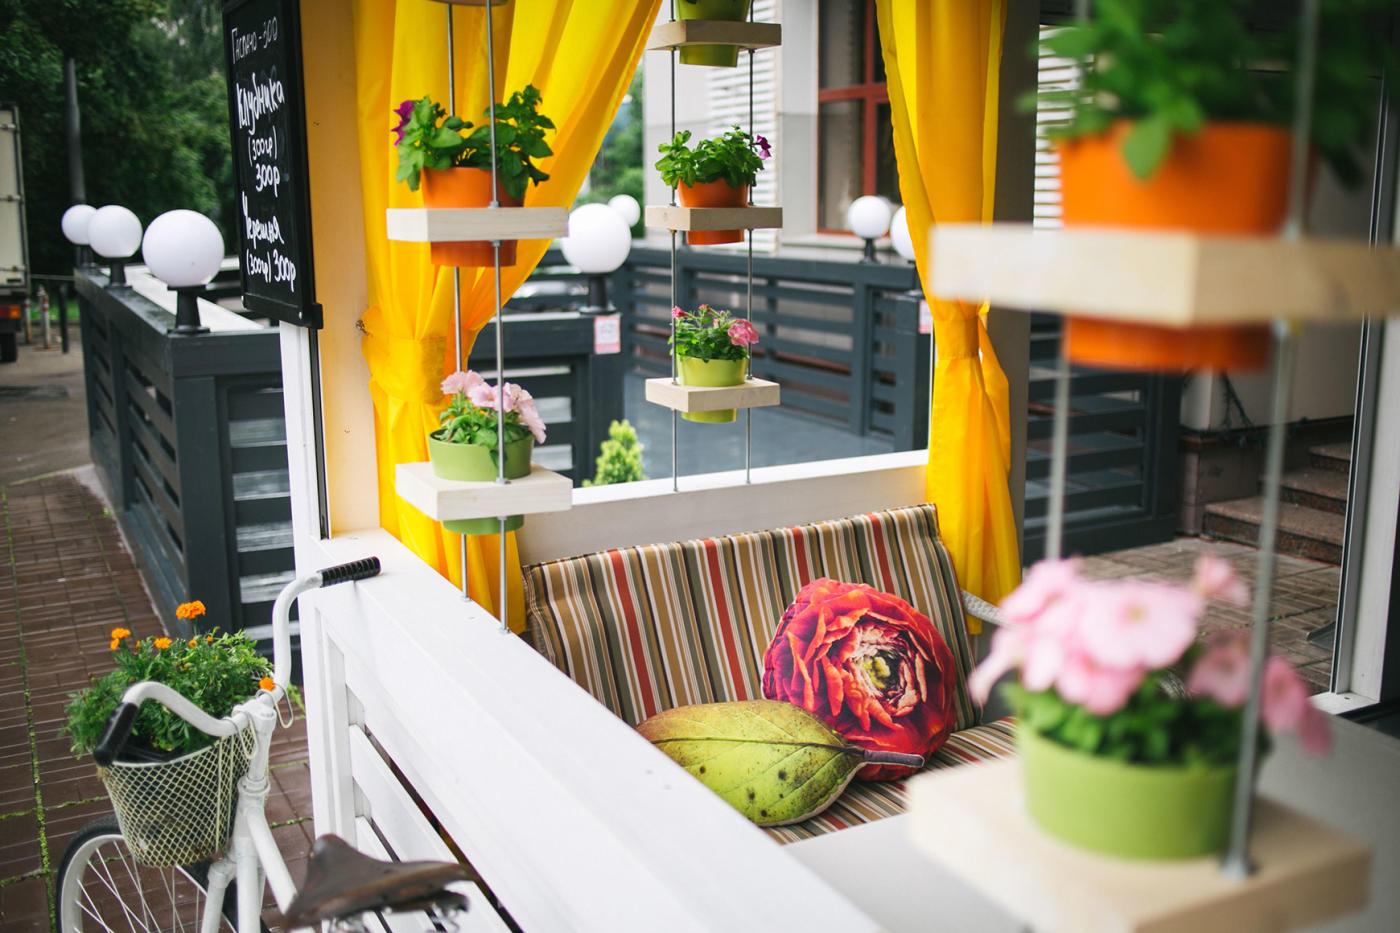 Кафе Гарден в Зеленограде (Garden) фото 17